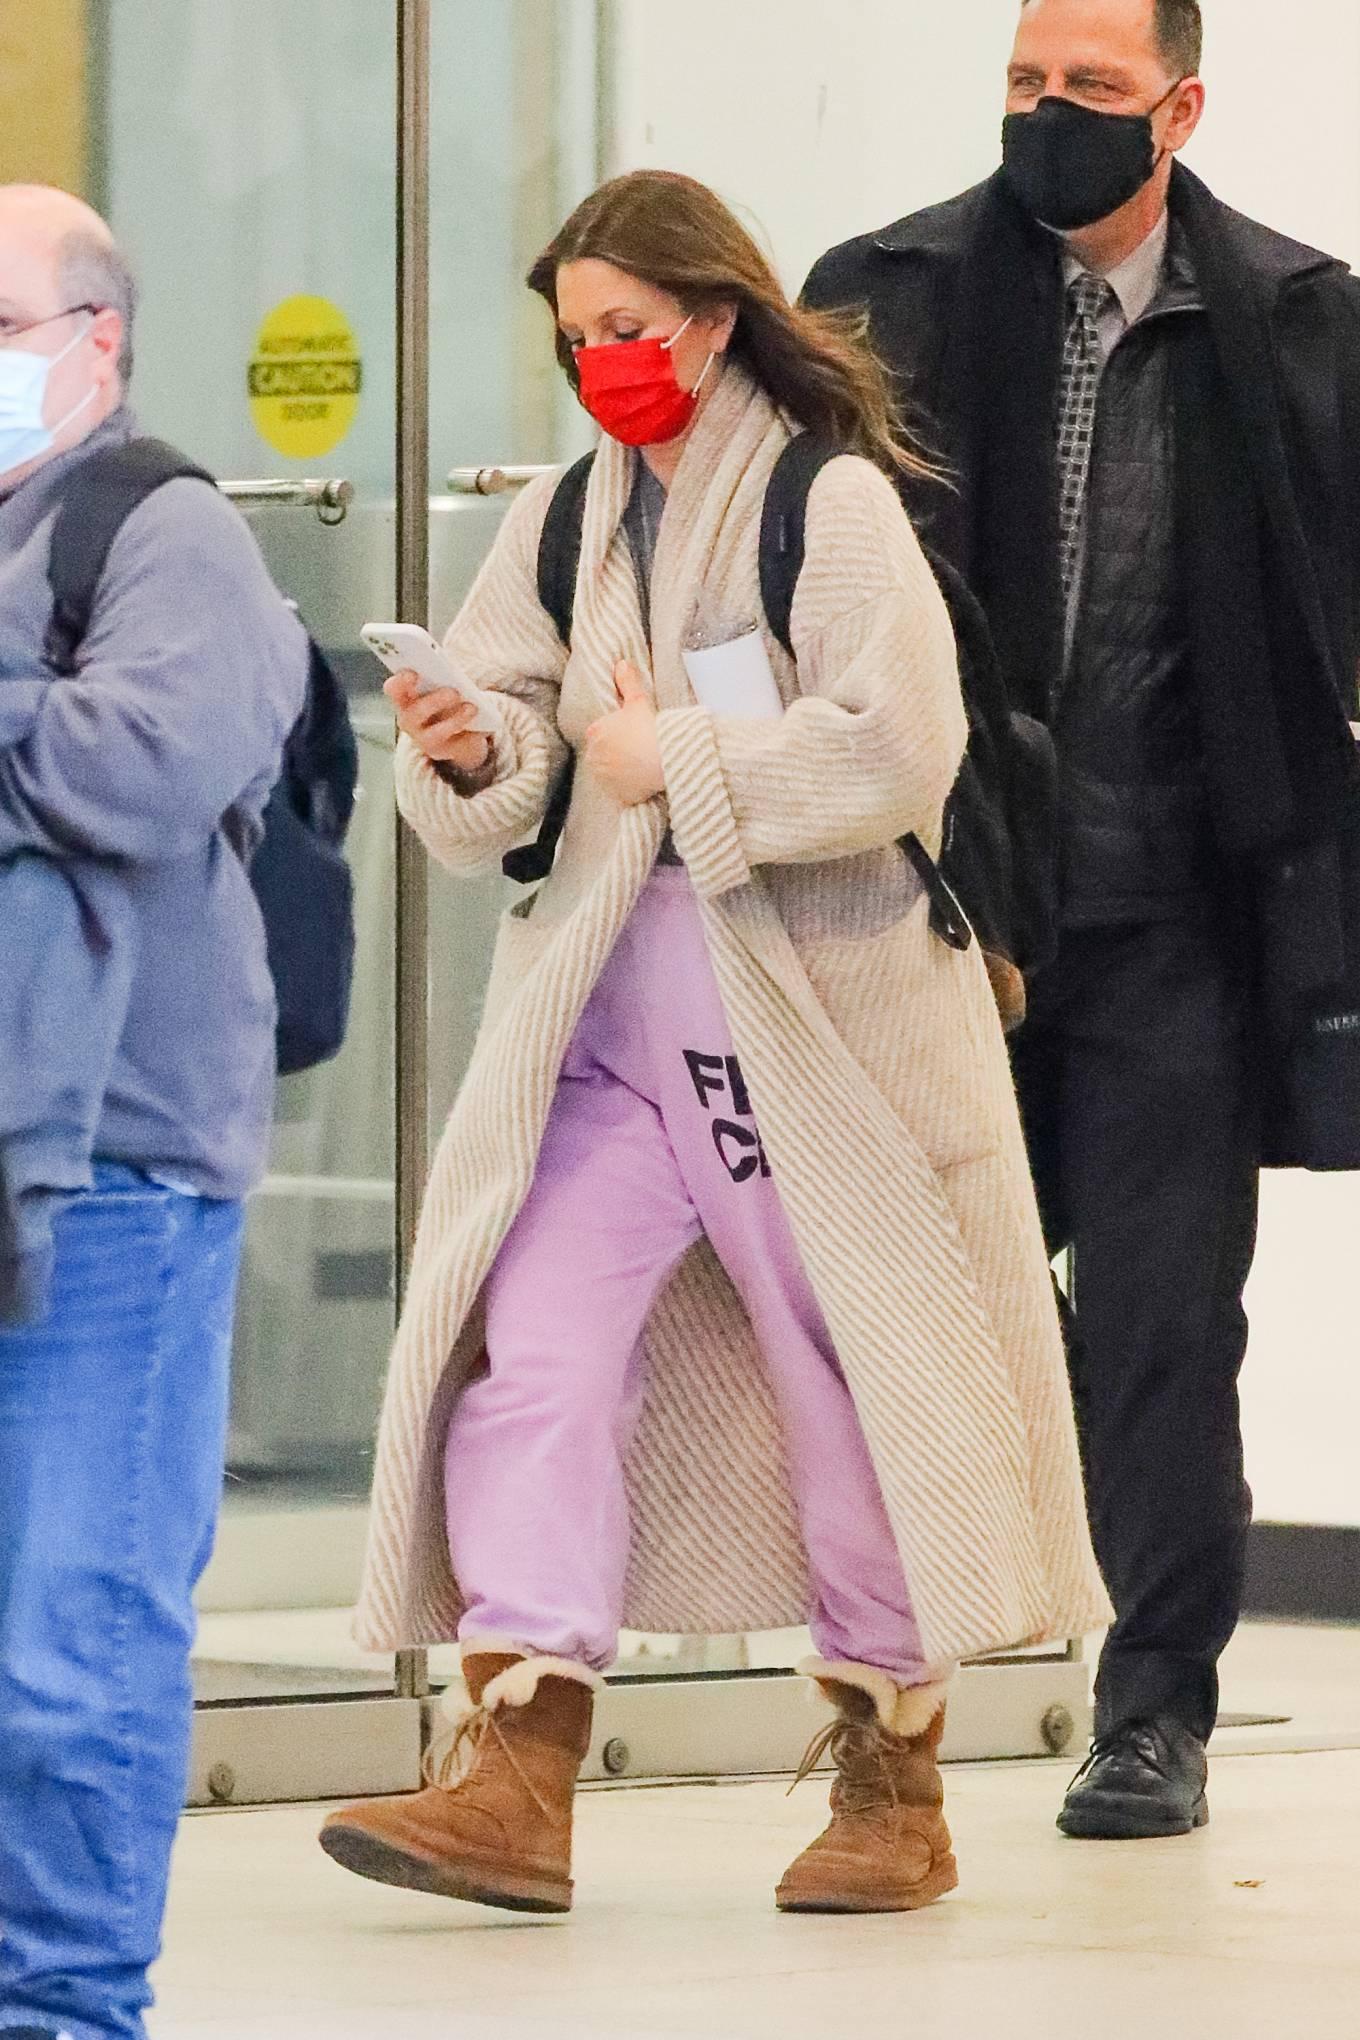 Drew Barrymore - Seen leaving CBS in New York